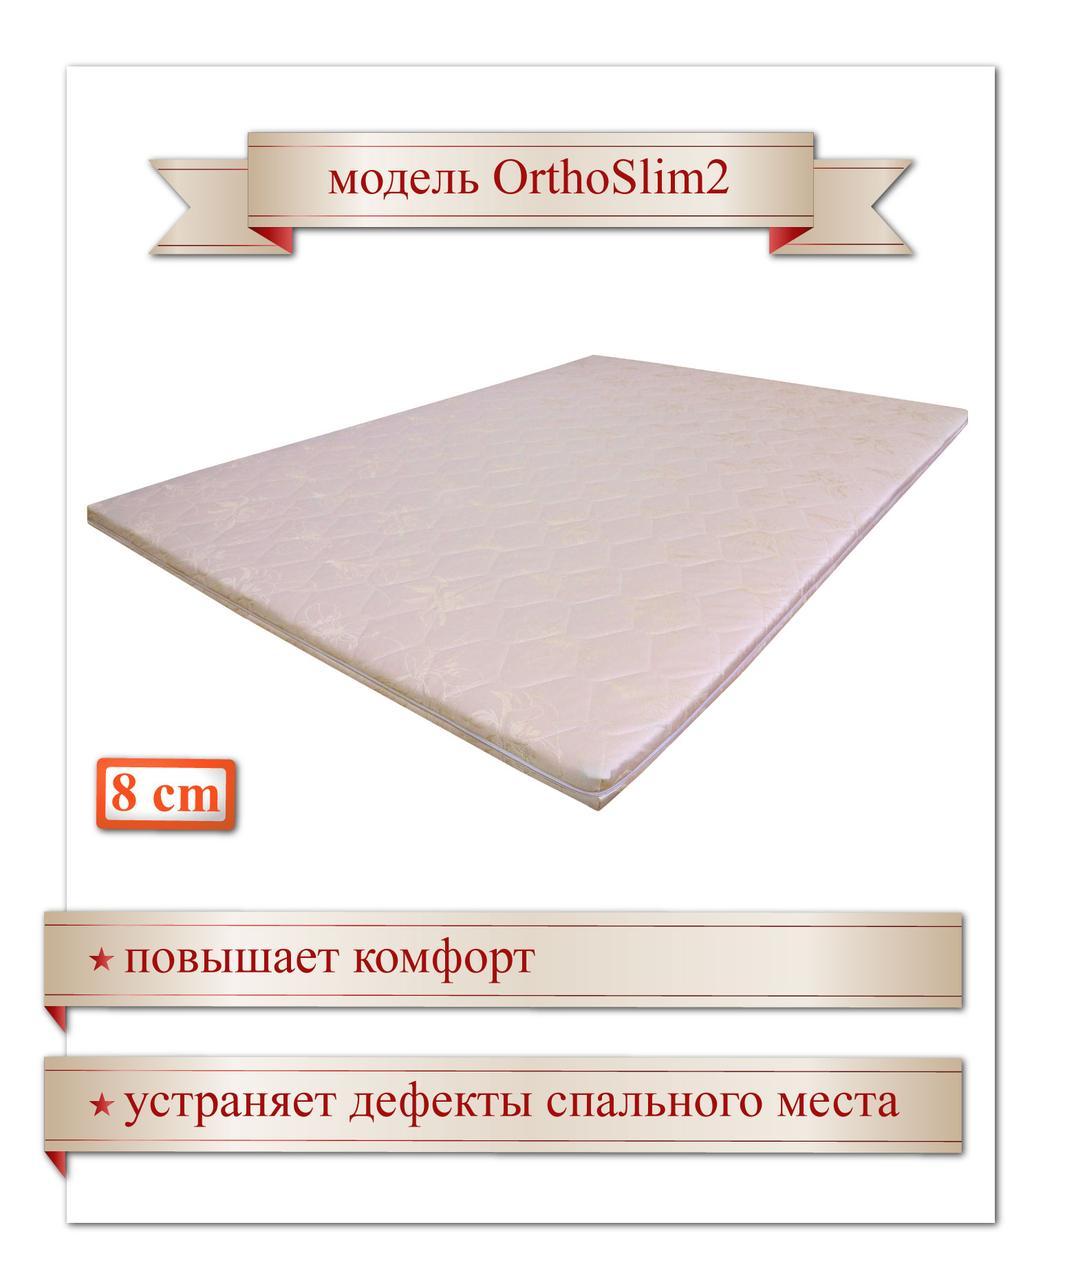 OrthoSlim2, 200х140х8 см, Тонкий ортопедический матрас (наматрасник, футон, топер)